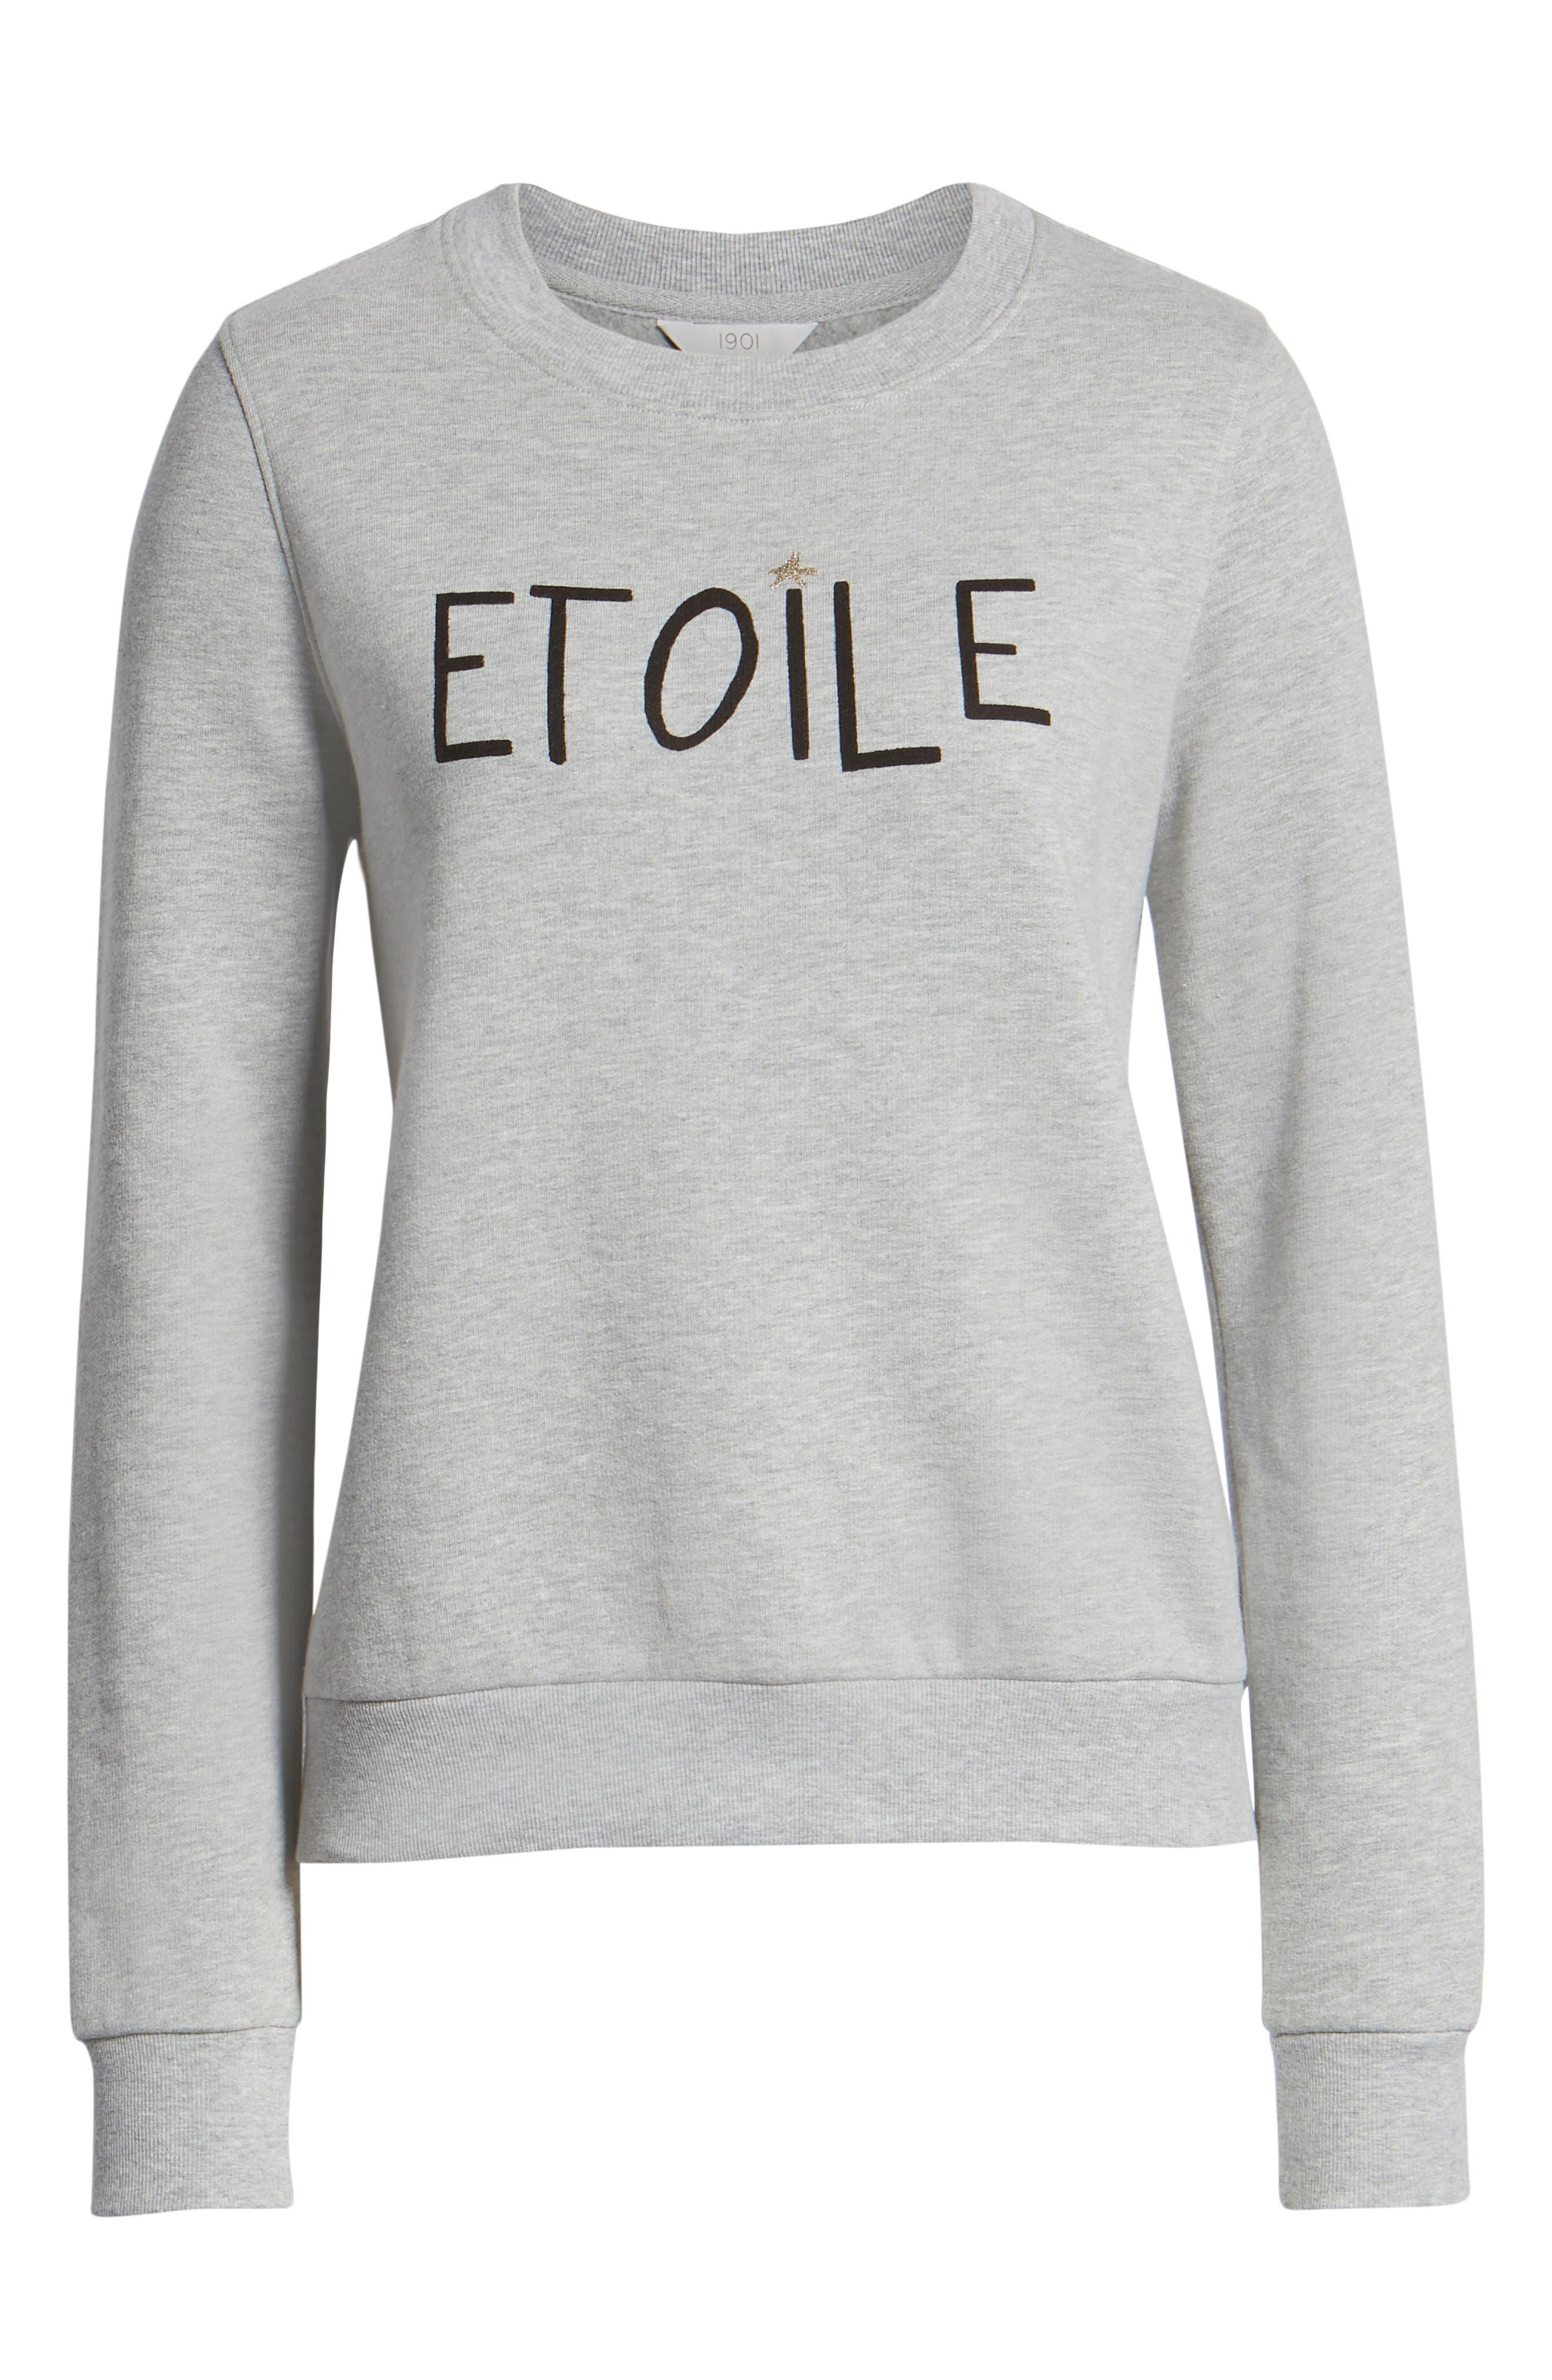 Etoile Sweatshirt,                             Alternate thumbnail 6, color,                             030